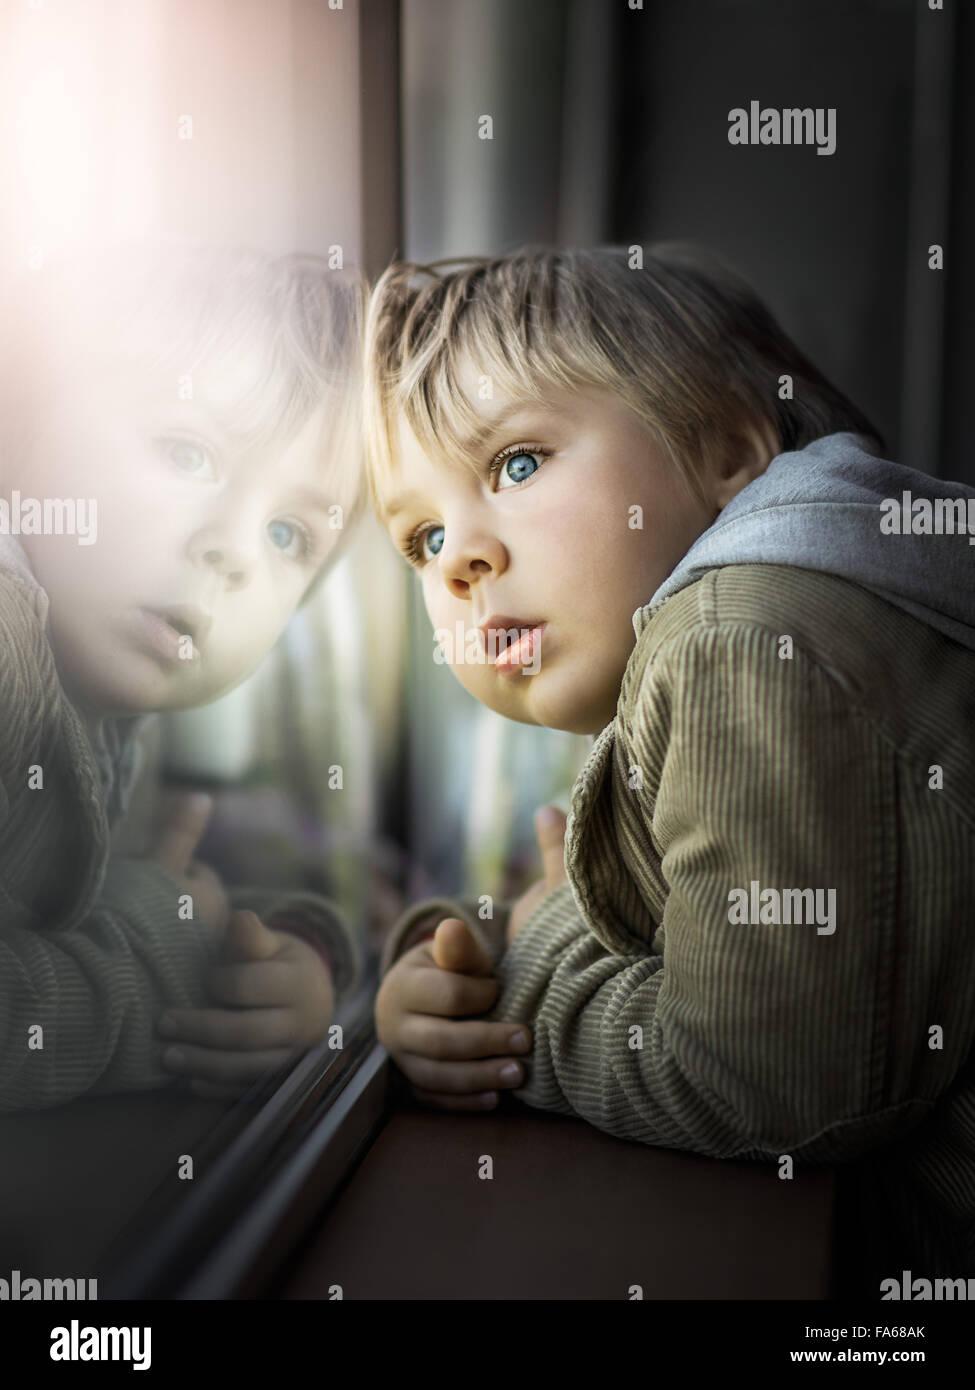 Boy looking through window - Stock Image